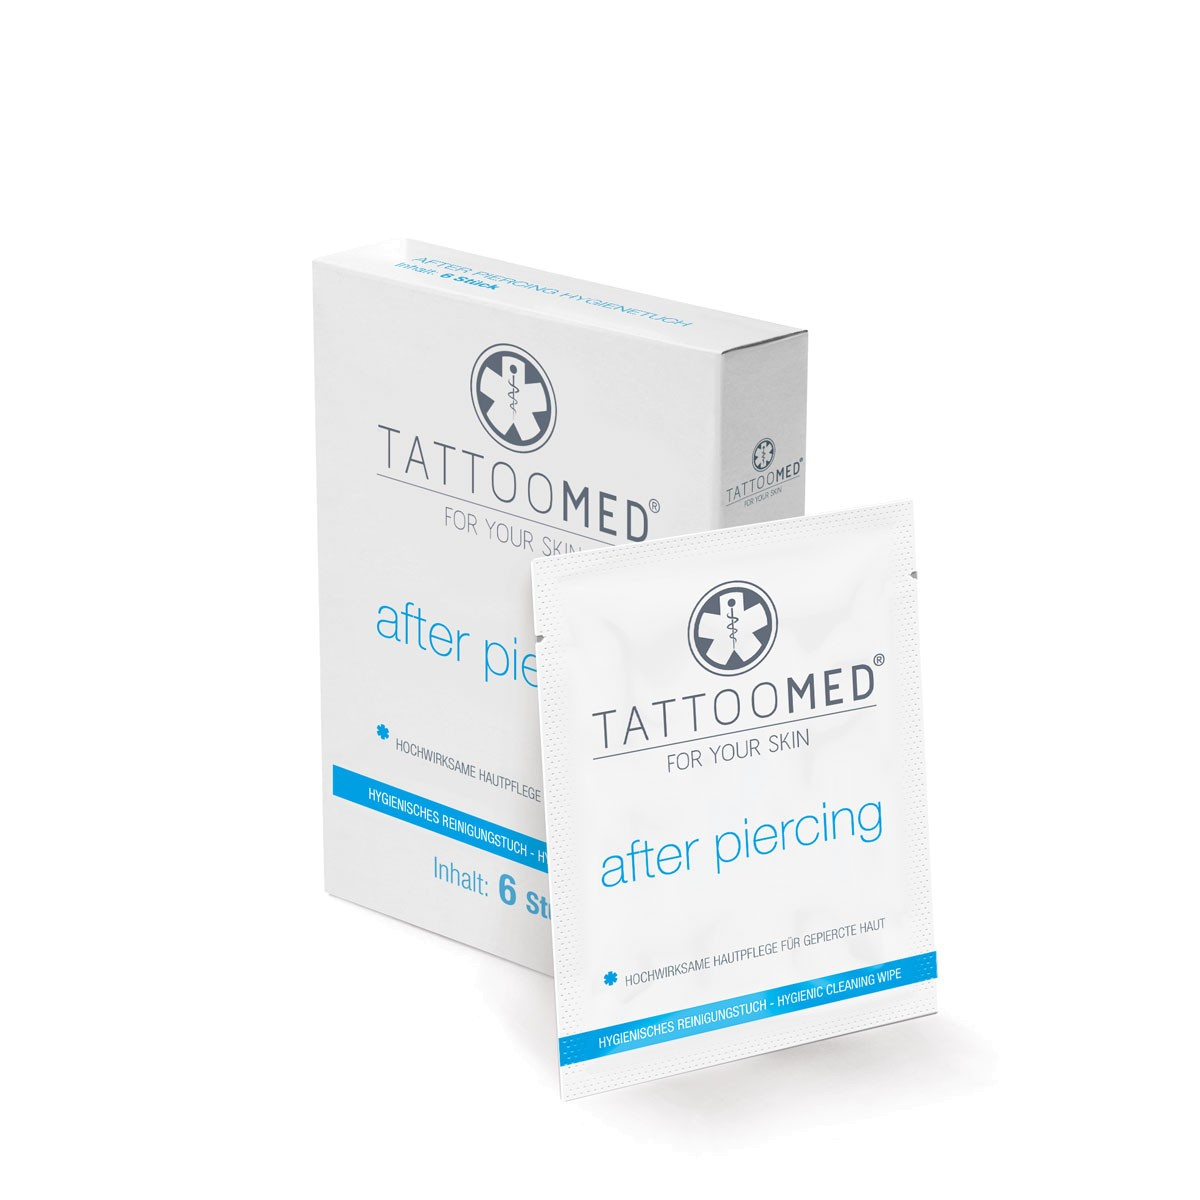 TattooMed® after piercing Hygienetuch (Box 6St.)